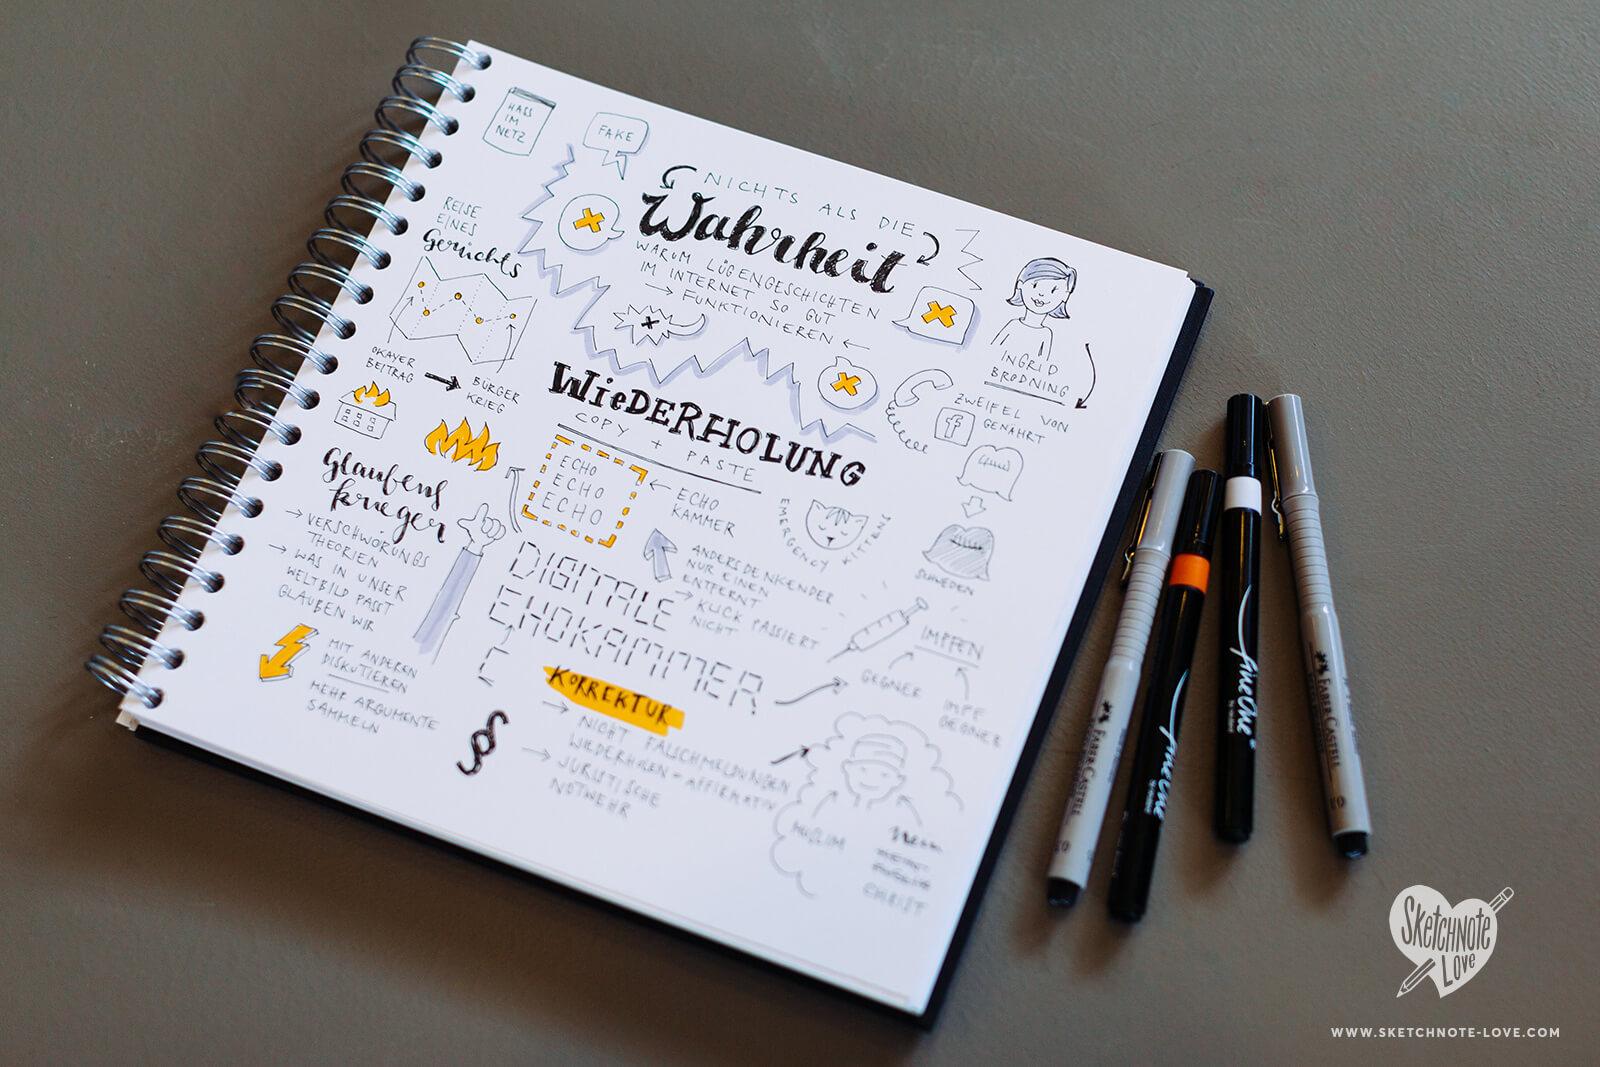 Sketchnotes Republica 2016 – Ingrid Brodning